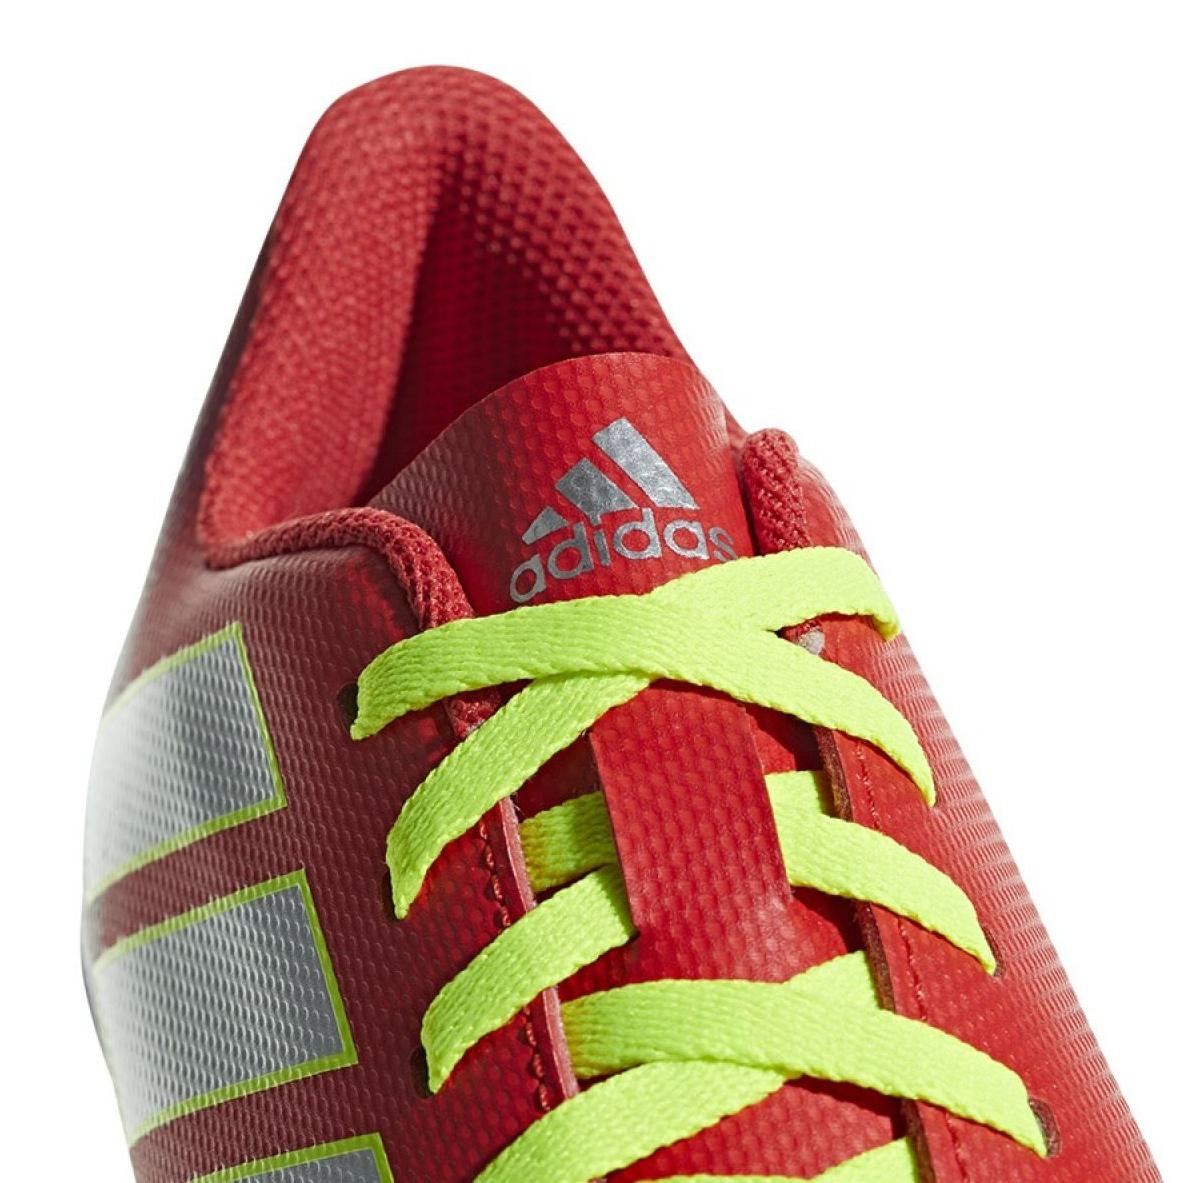 a0121e3303d2a Indoor-Schuhe adidas Nemeziz Messi 18.4 in Jr. CM8639 - ButyModne.pl